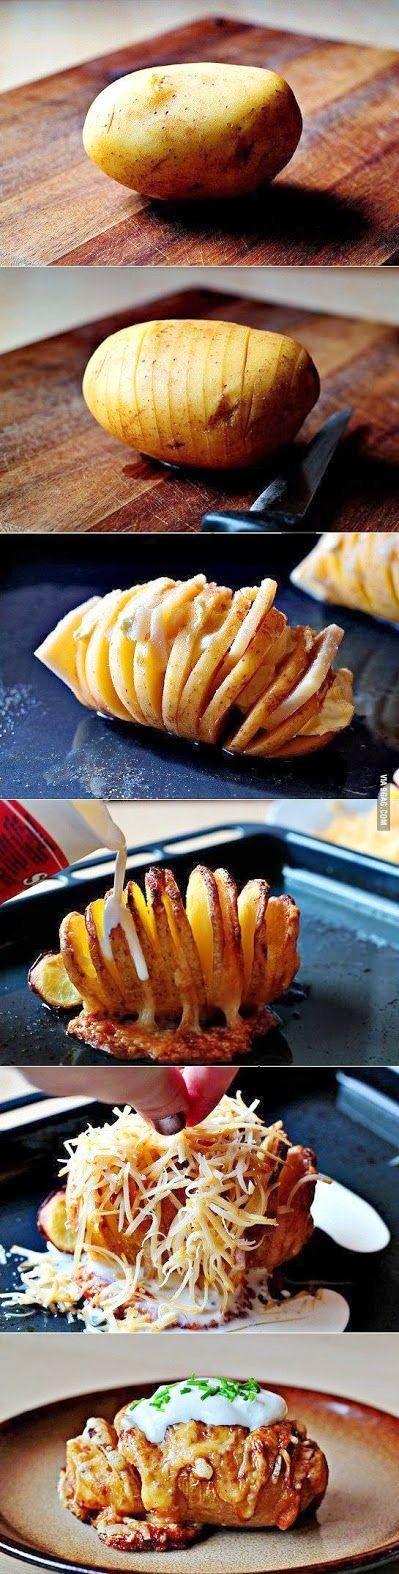 Baked potato stuffed with cheese Patata al horno rellena de queso Subido de Pinterest. http://www.isladelecturas.es/index.php/noticias/libros/835-las-aventuras-de-indiana-juana-de-jaime-fuster A la venta en AMAZON. Feliz lectura.